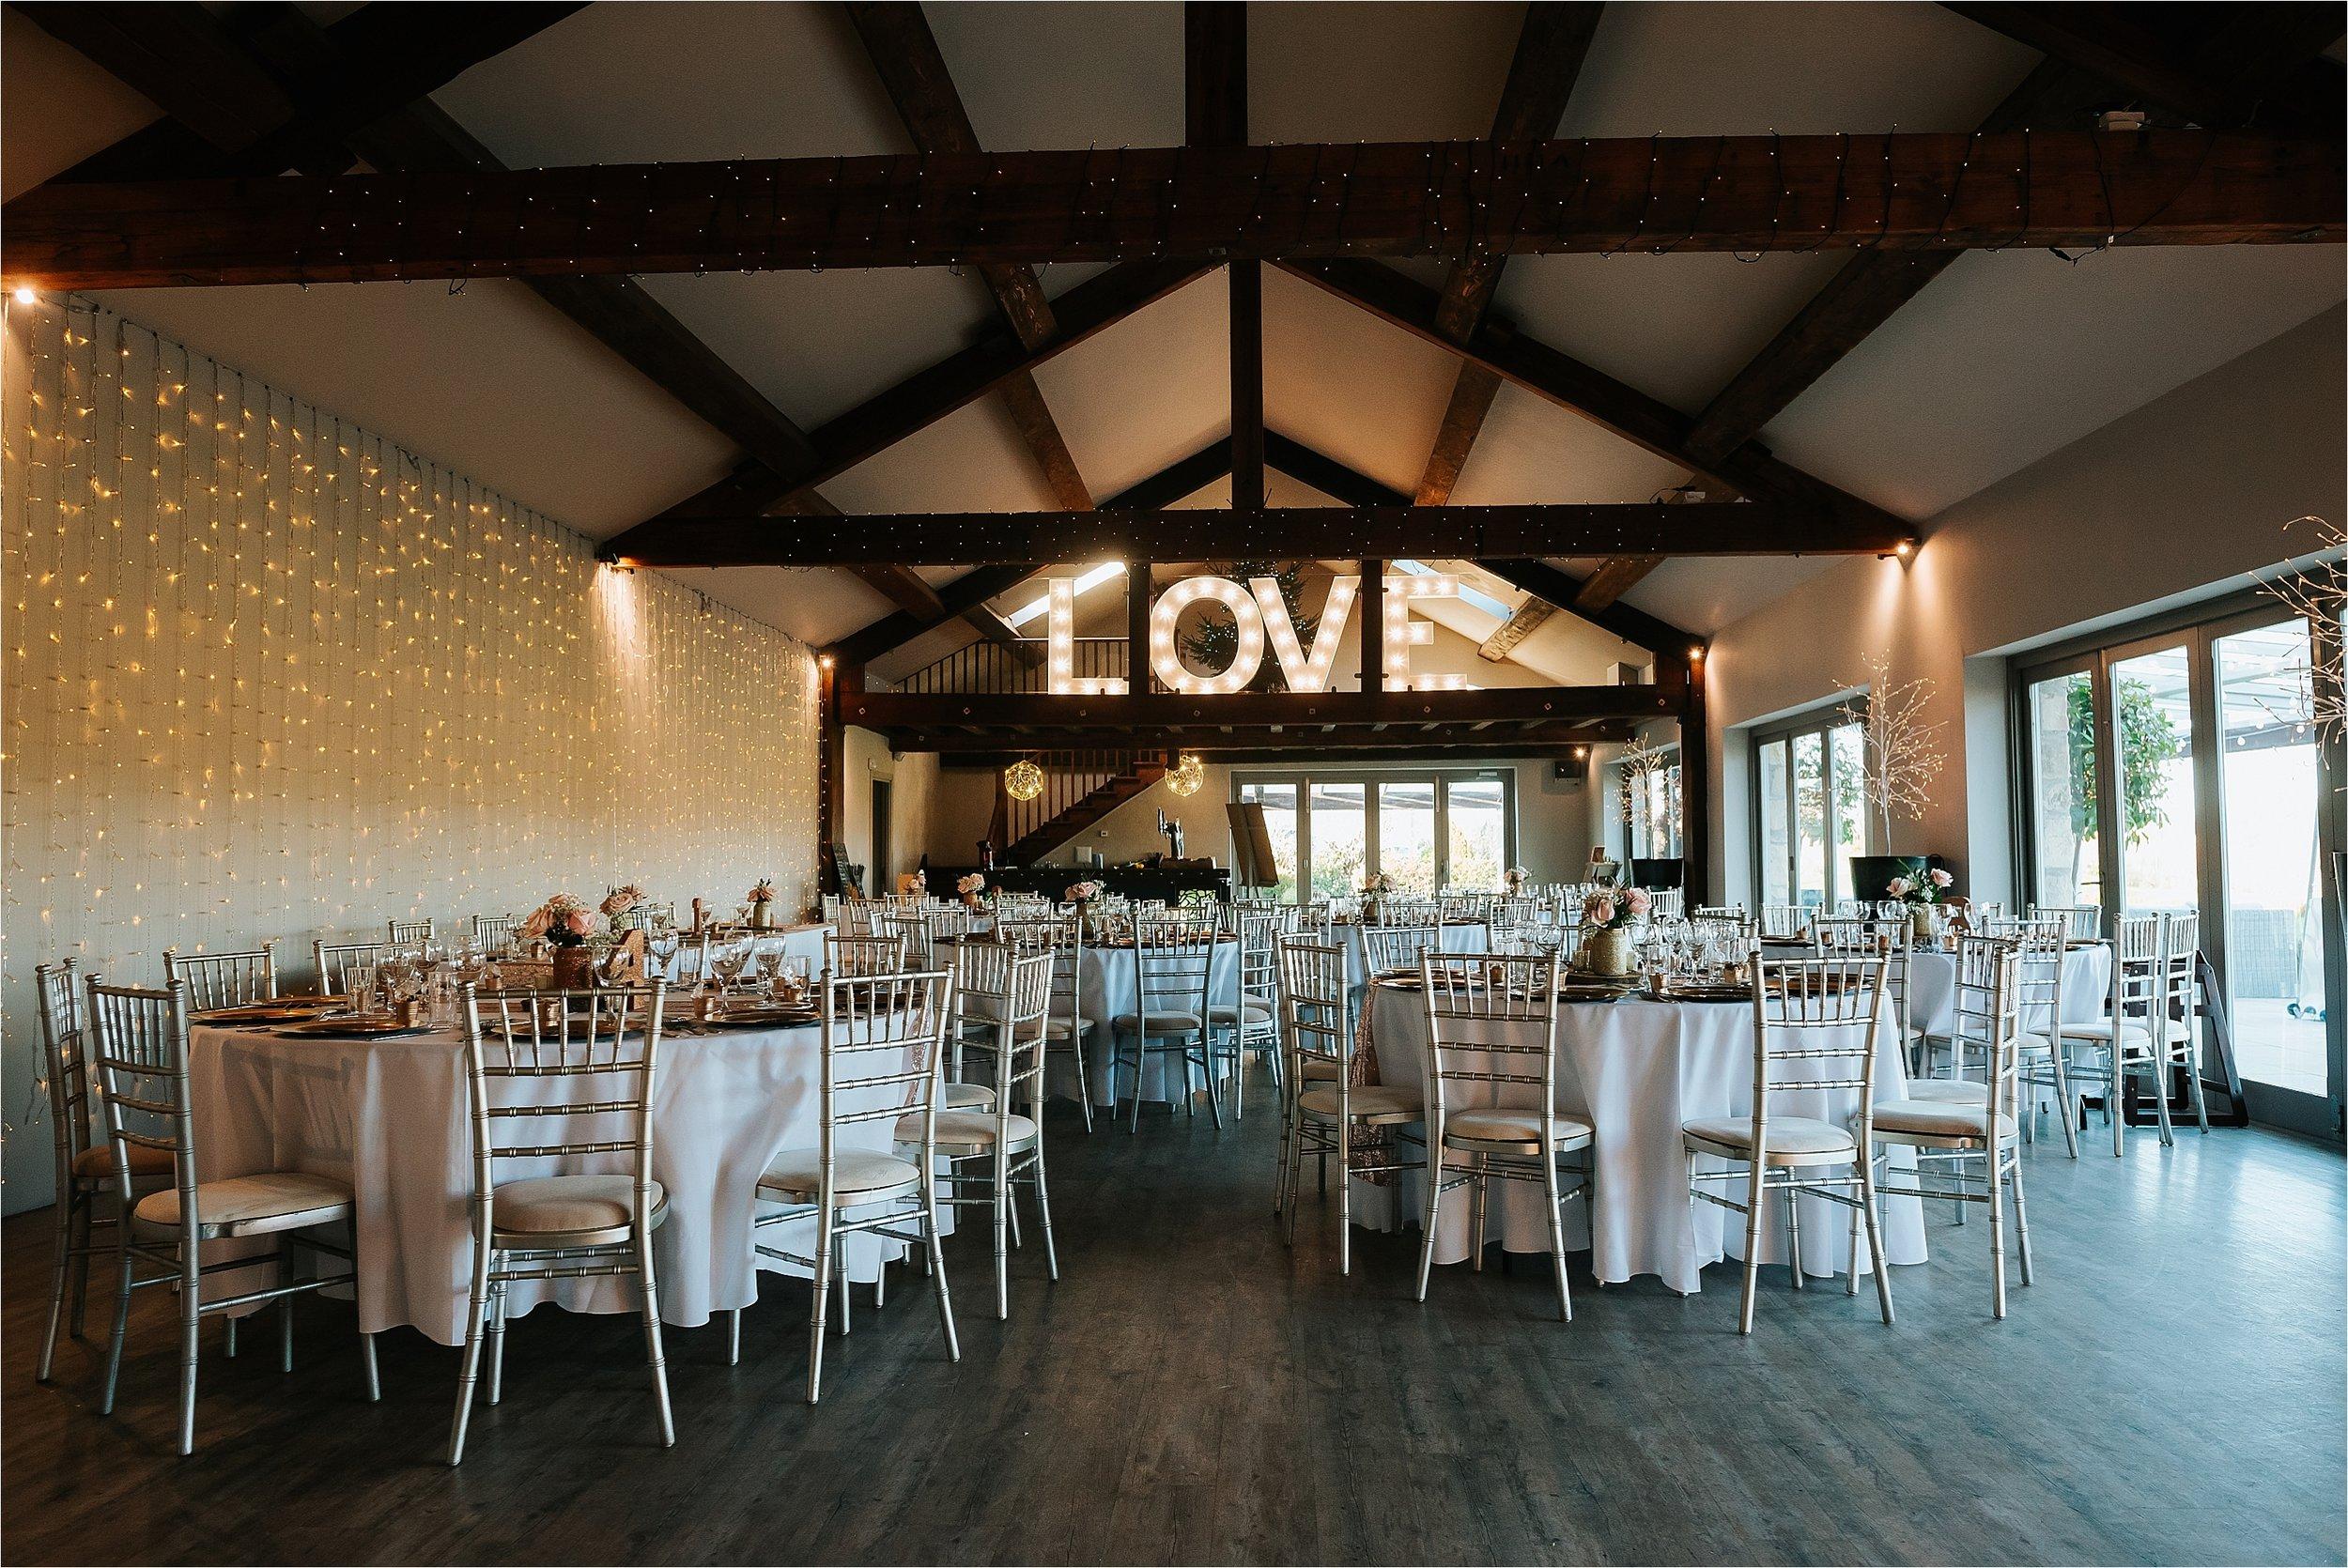 Inside of Yorkshire wedding barn